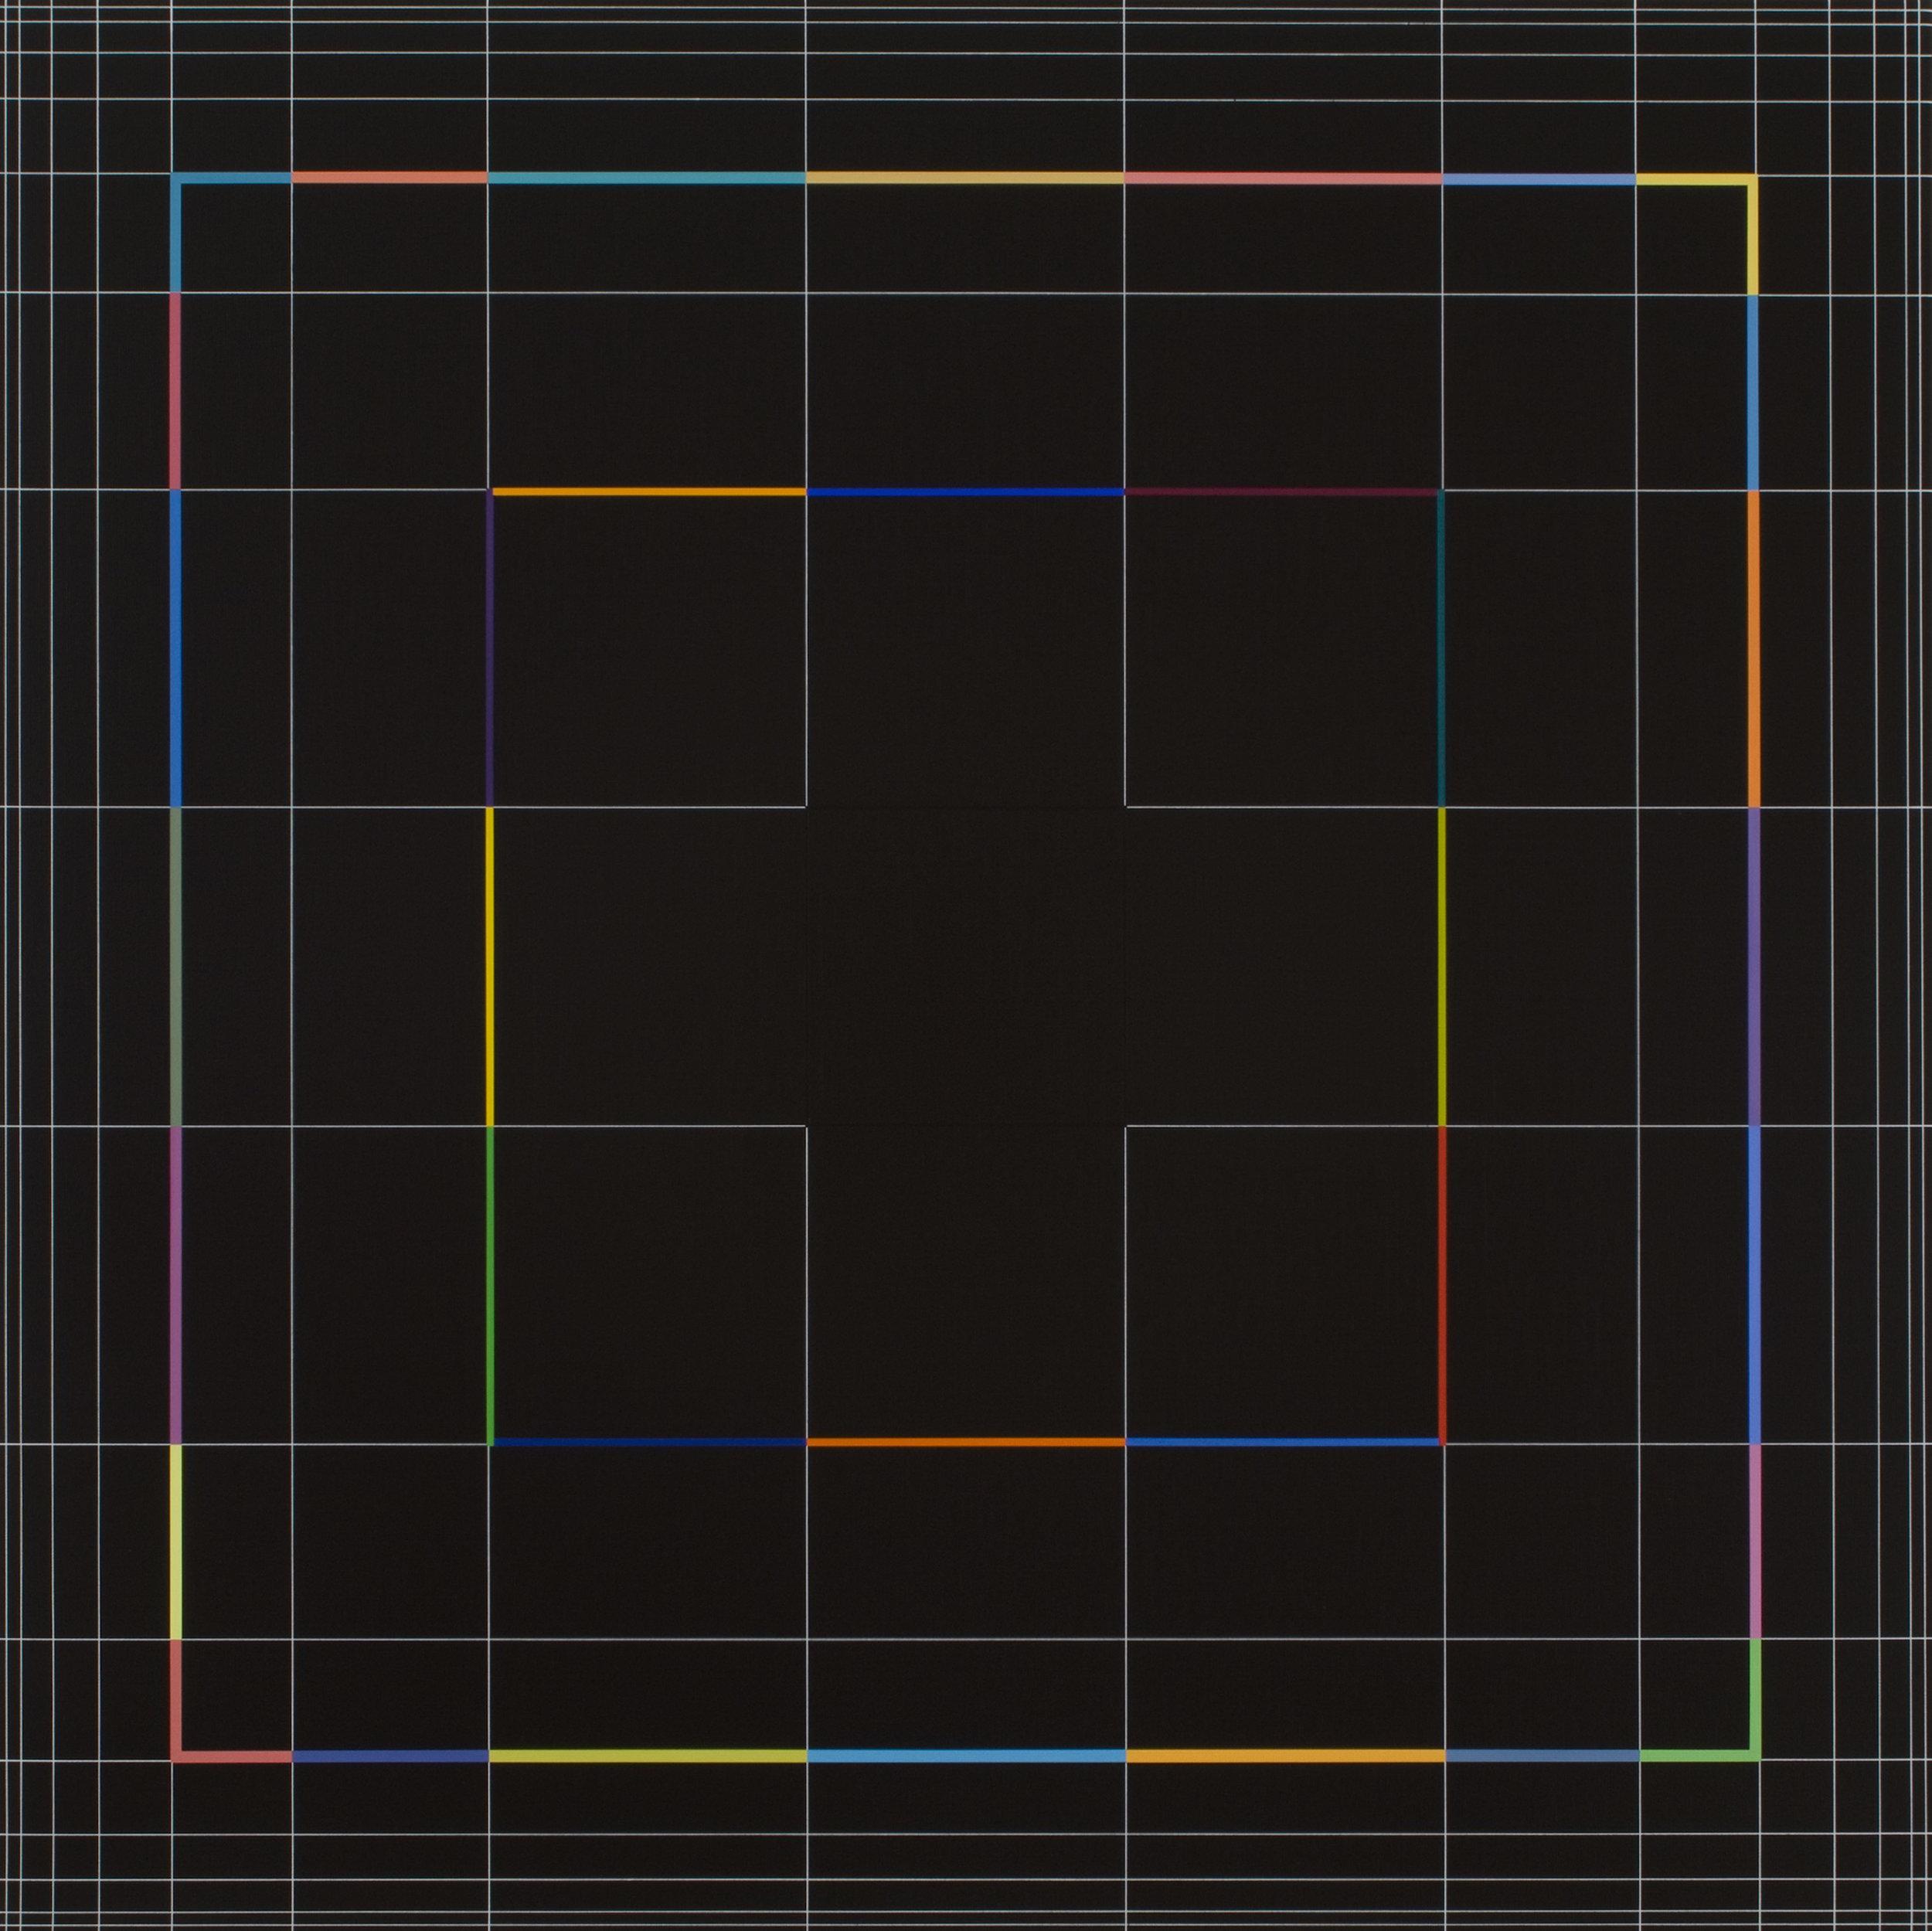 Yantra-ipsum(1)2012.Oct, acrylic on canvas, 35 7/16 x 35 7/16 in. [90x90cm]